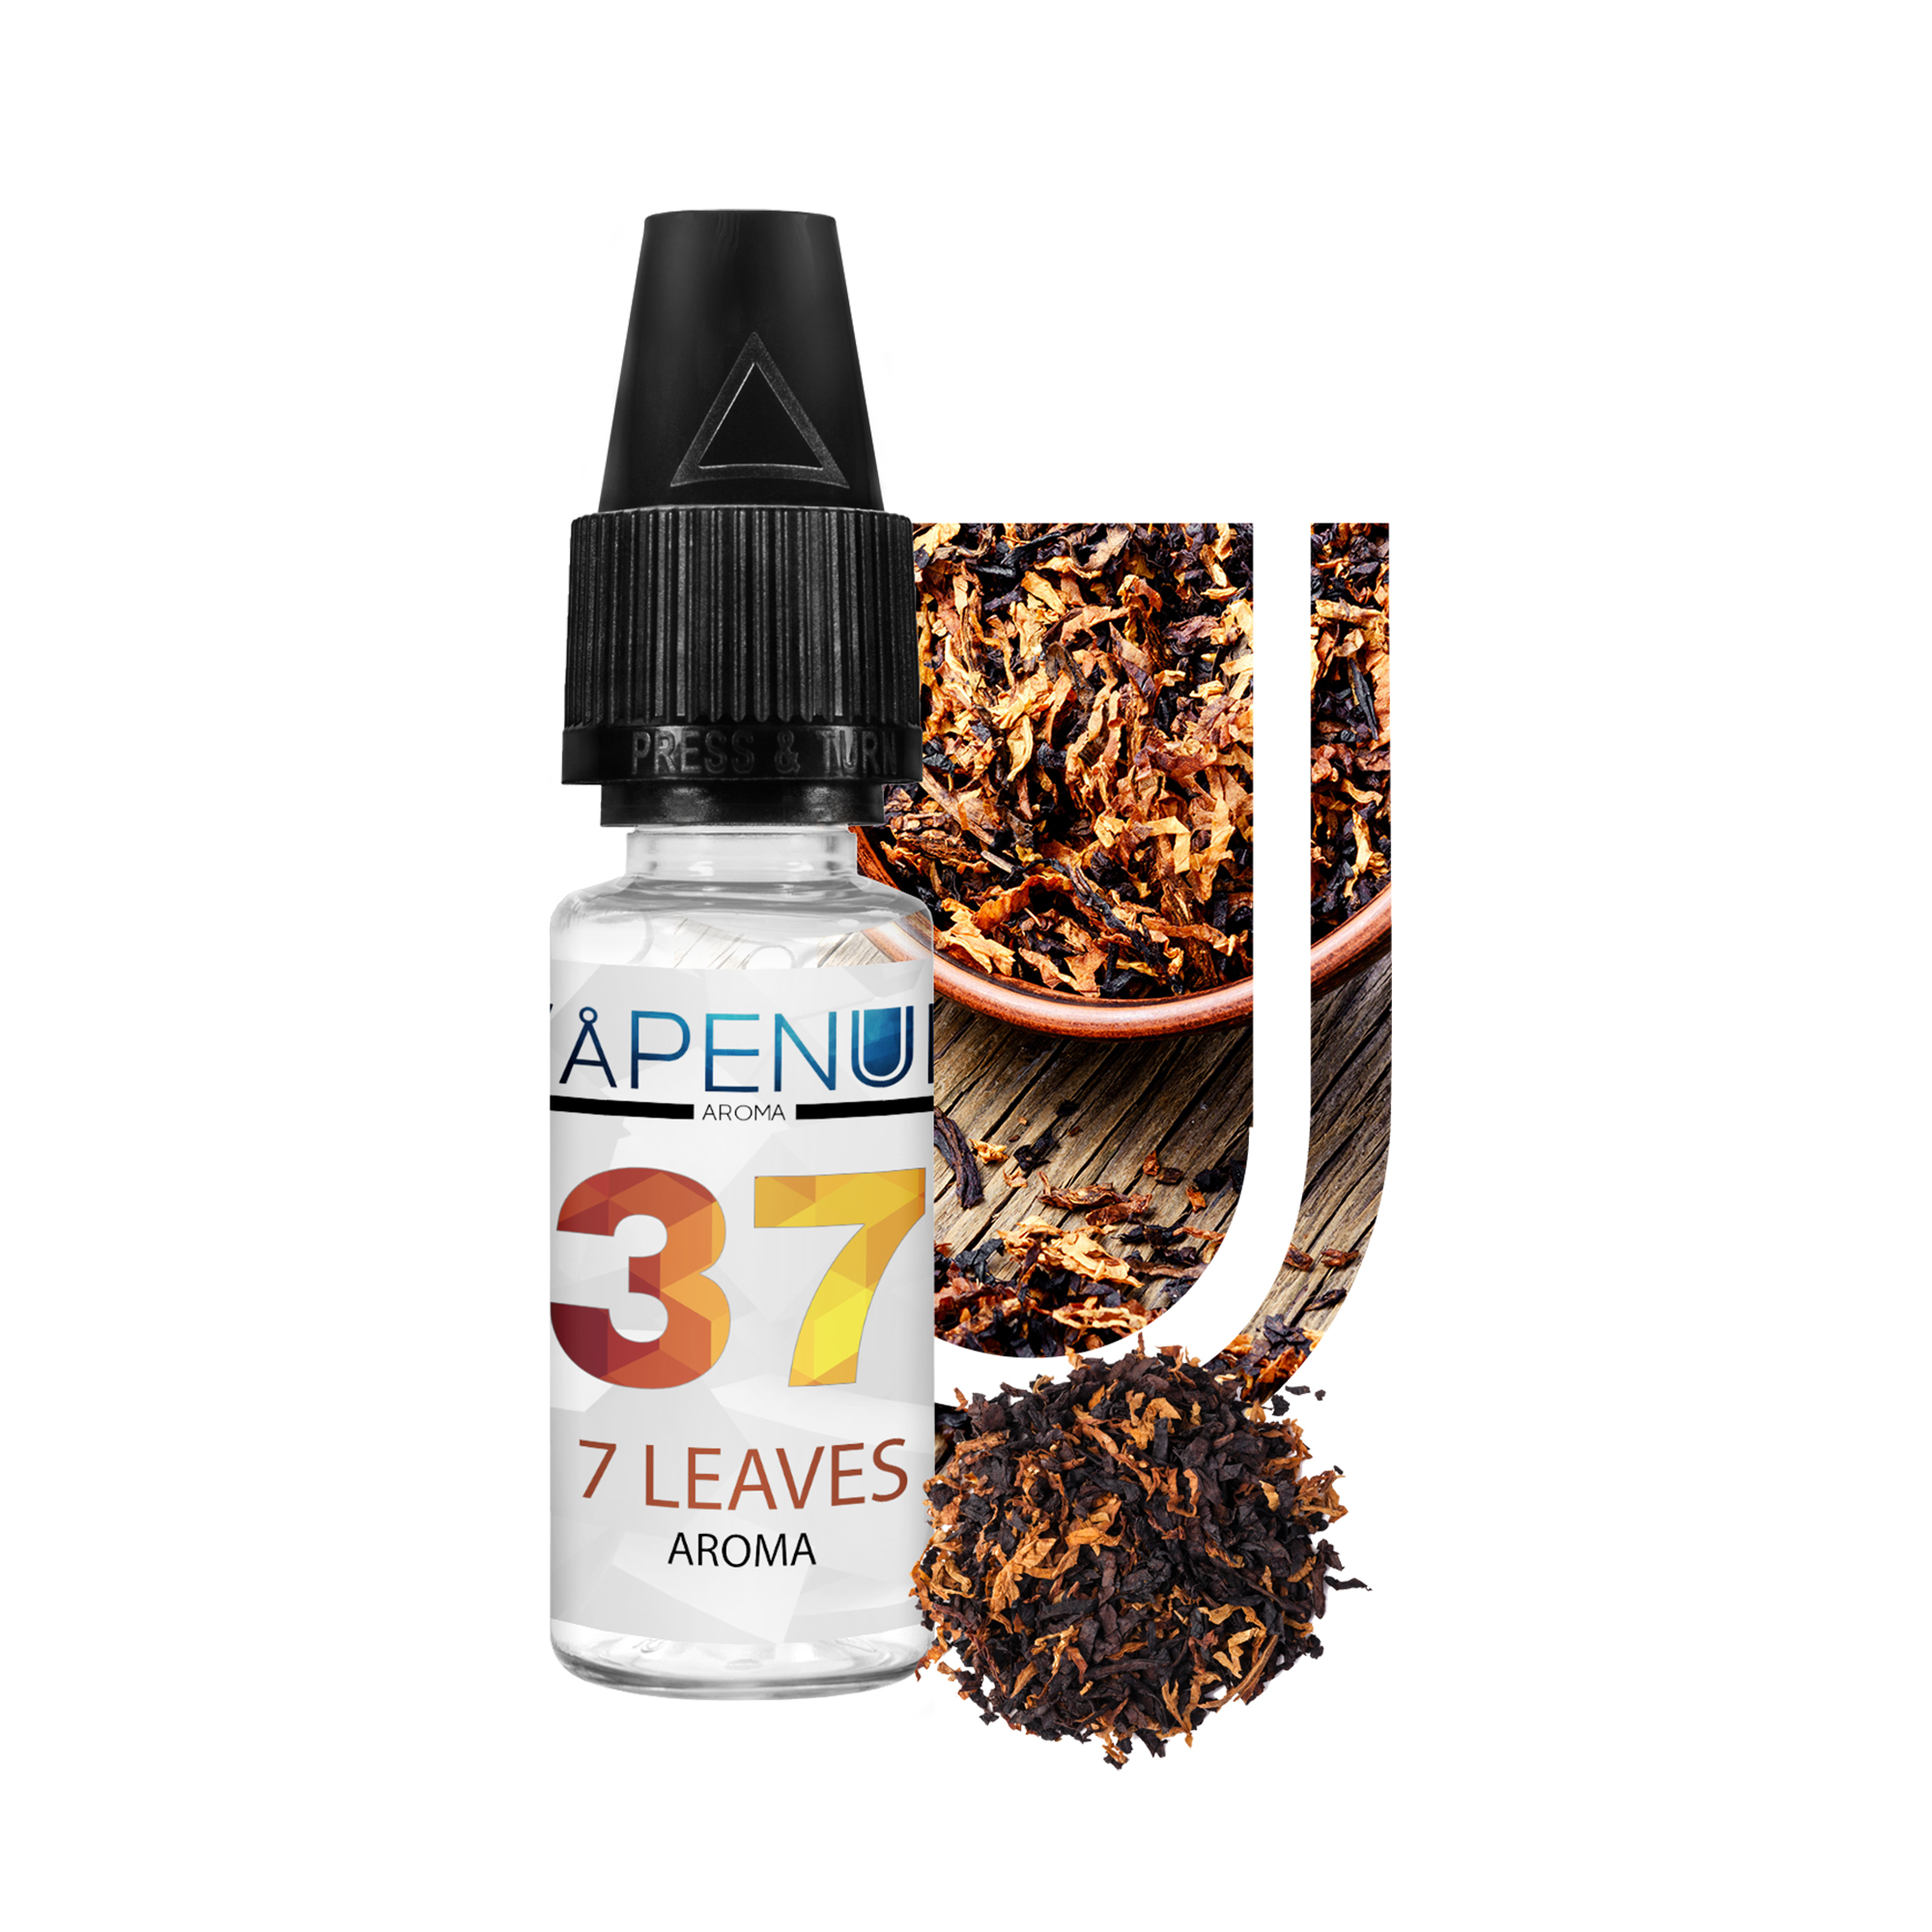 37 - 7 Leaves Aroma by Vapenum